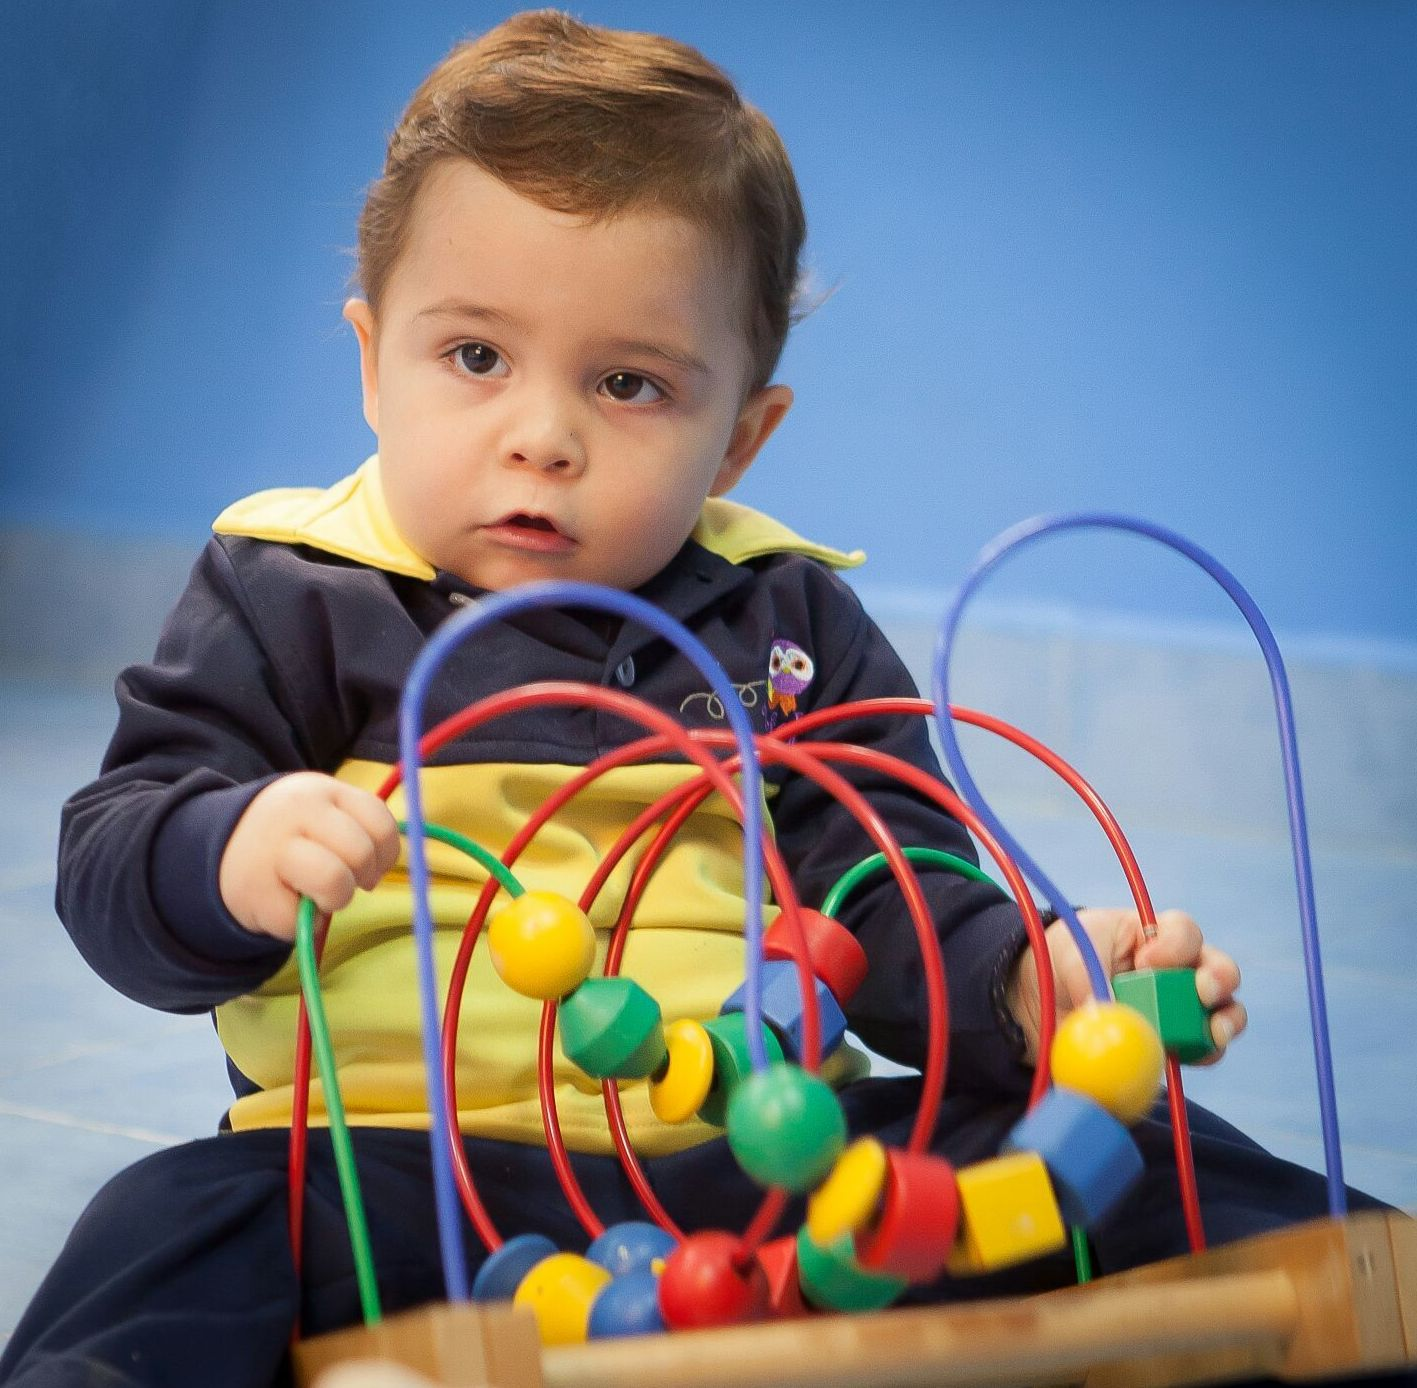 Foto 3 de Escuelas infantiles en Umbrete | Pipiolos Escuela Infantil